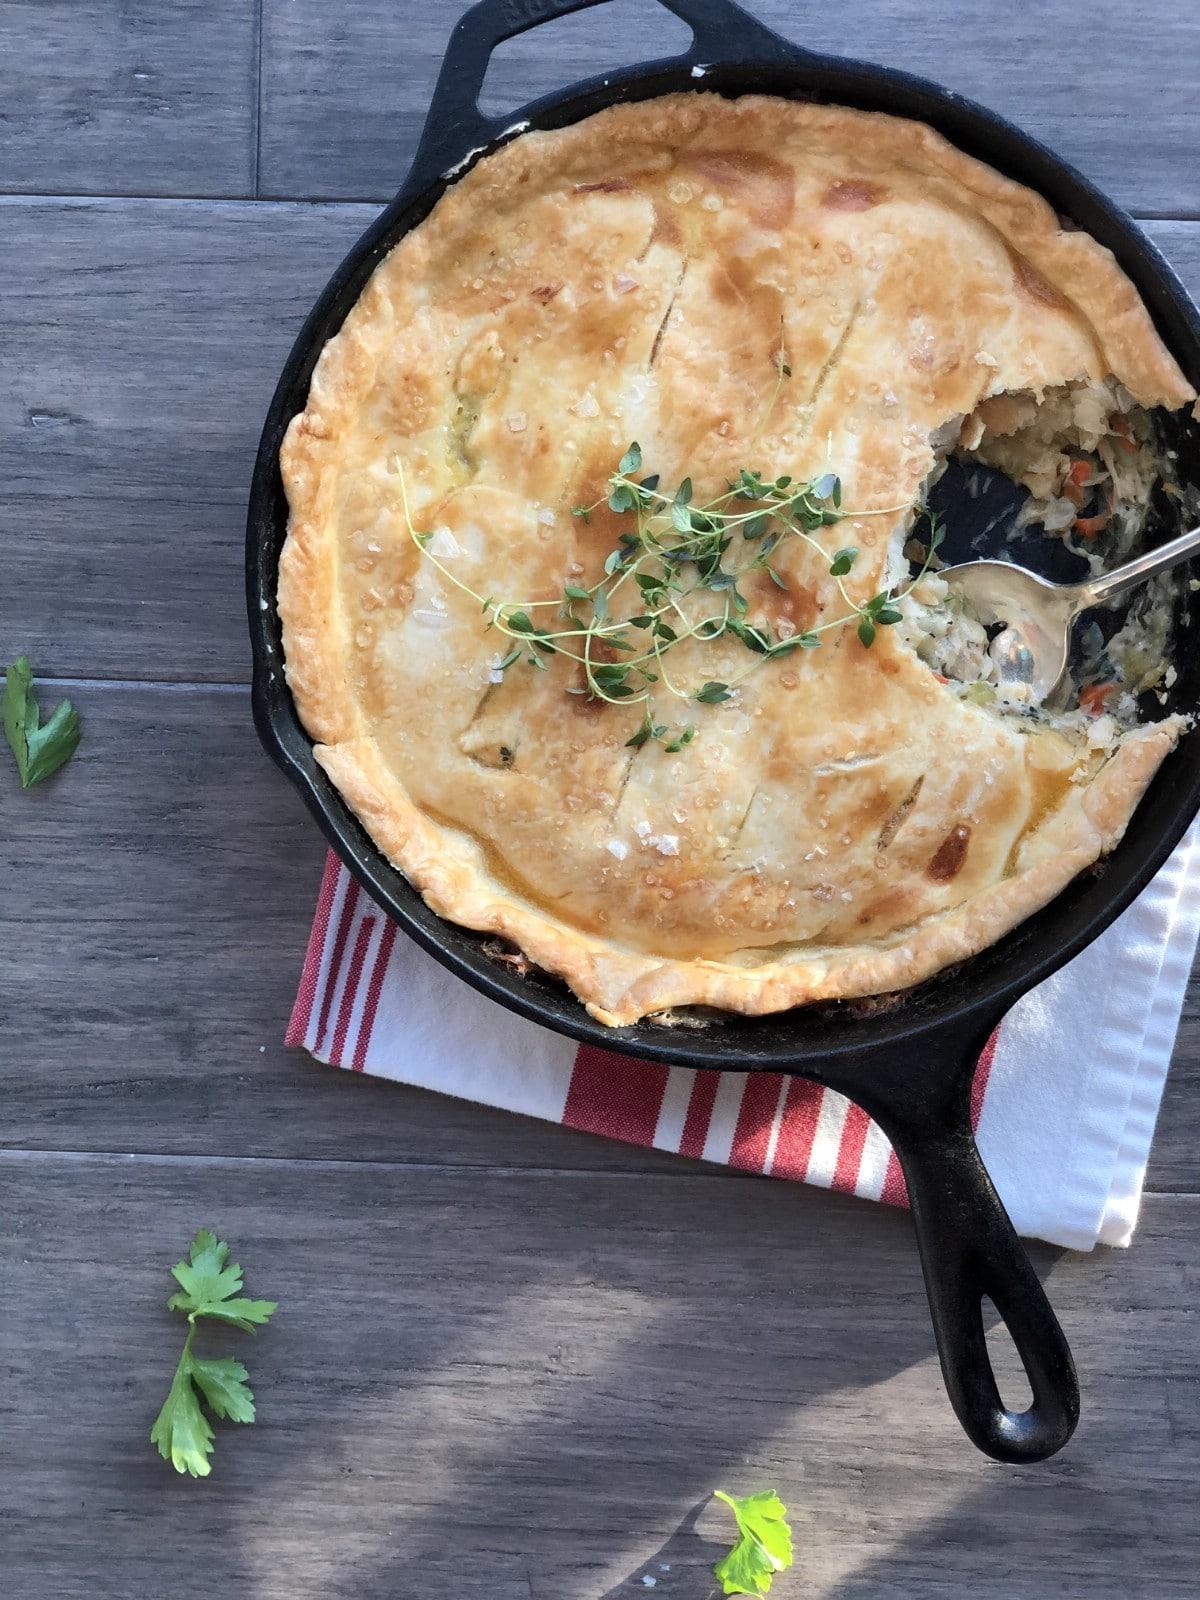 Spoon in skillet of chicken pot pie